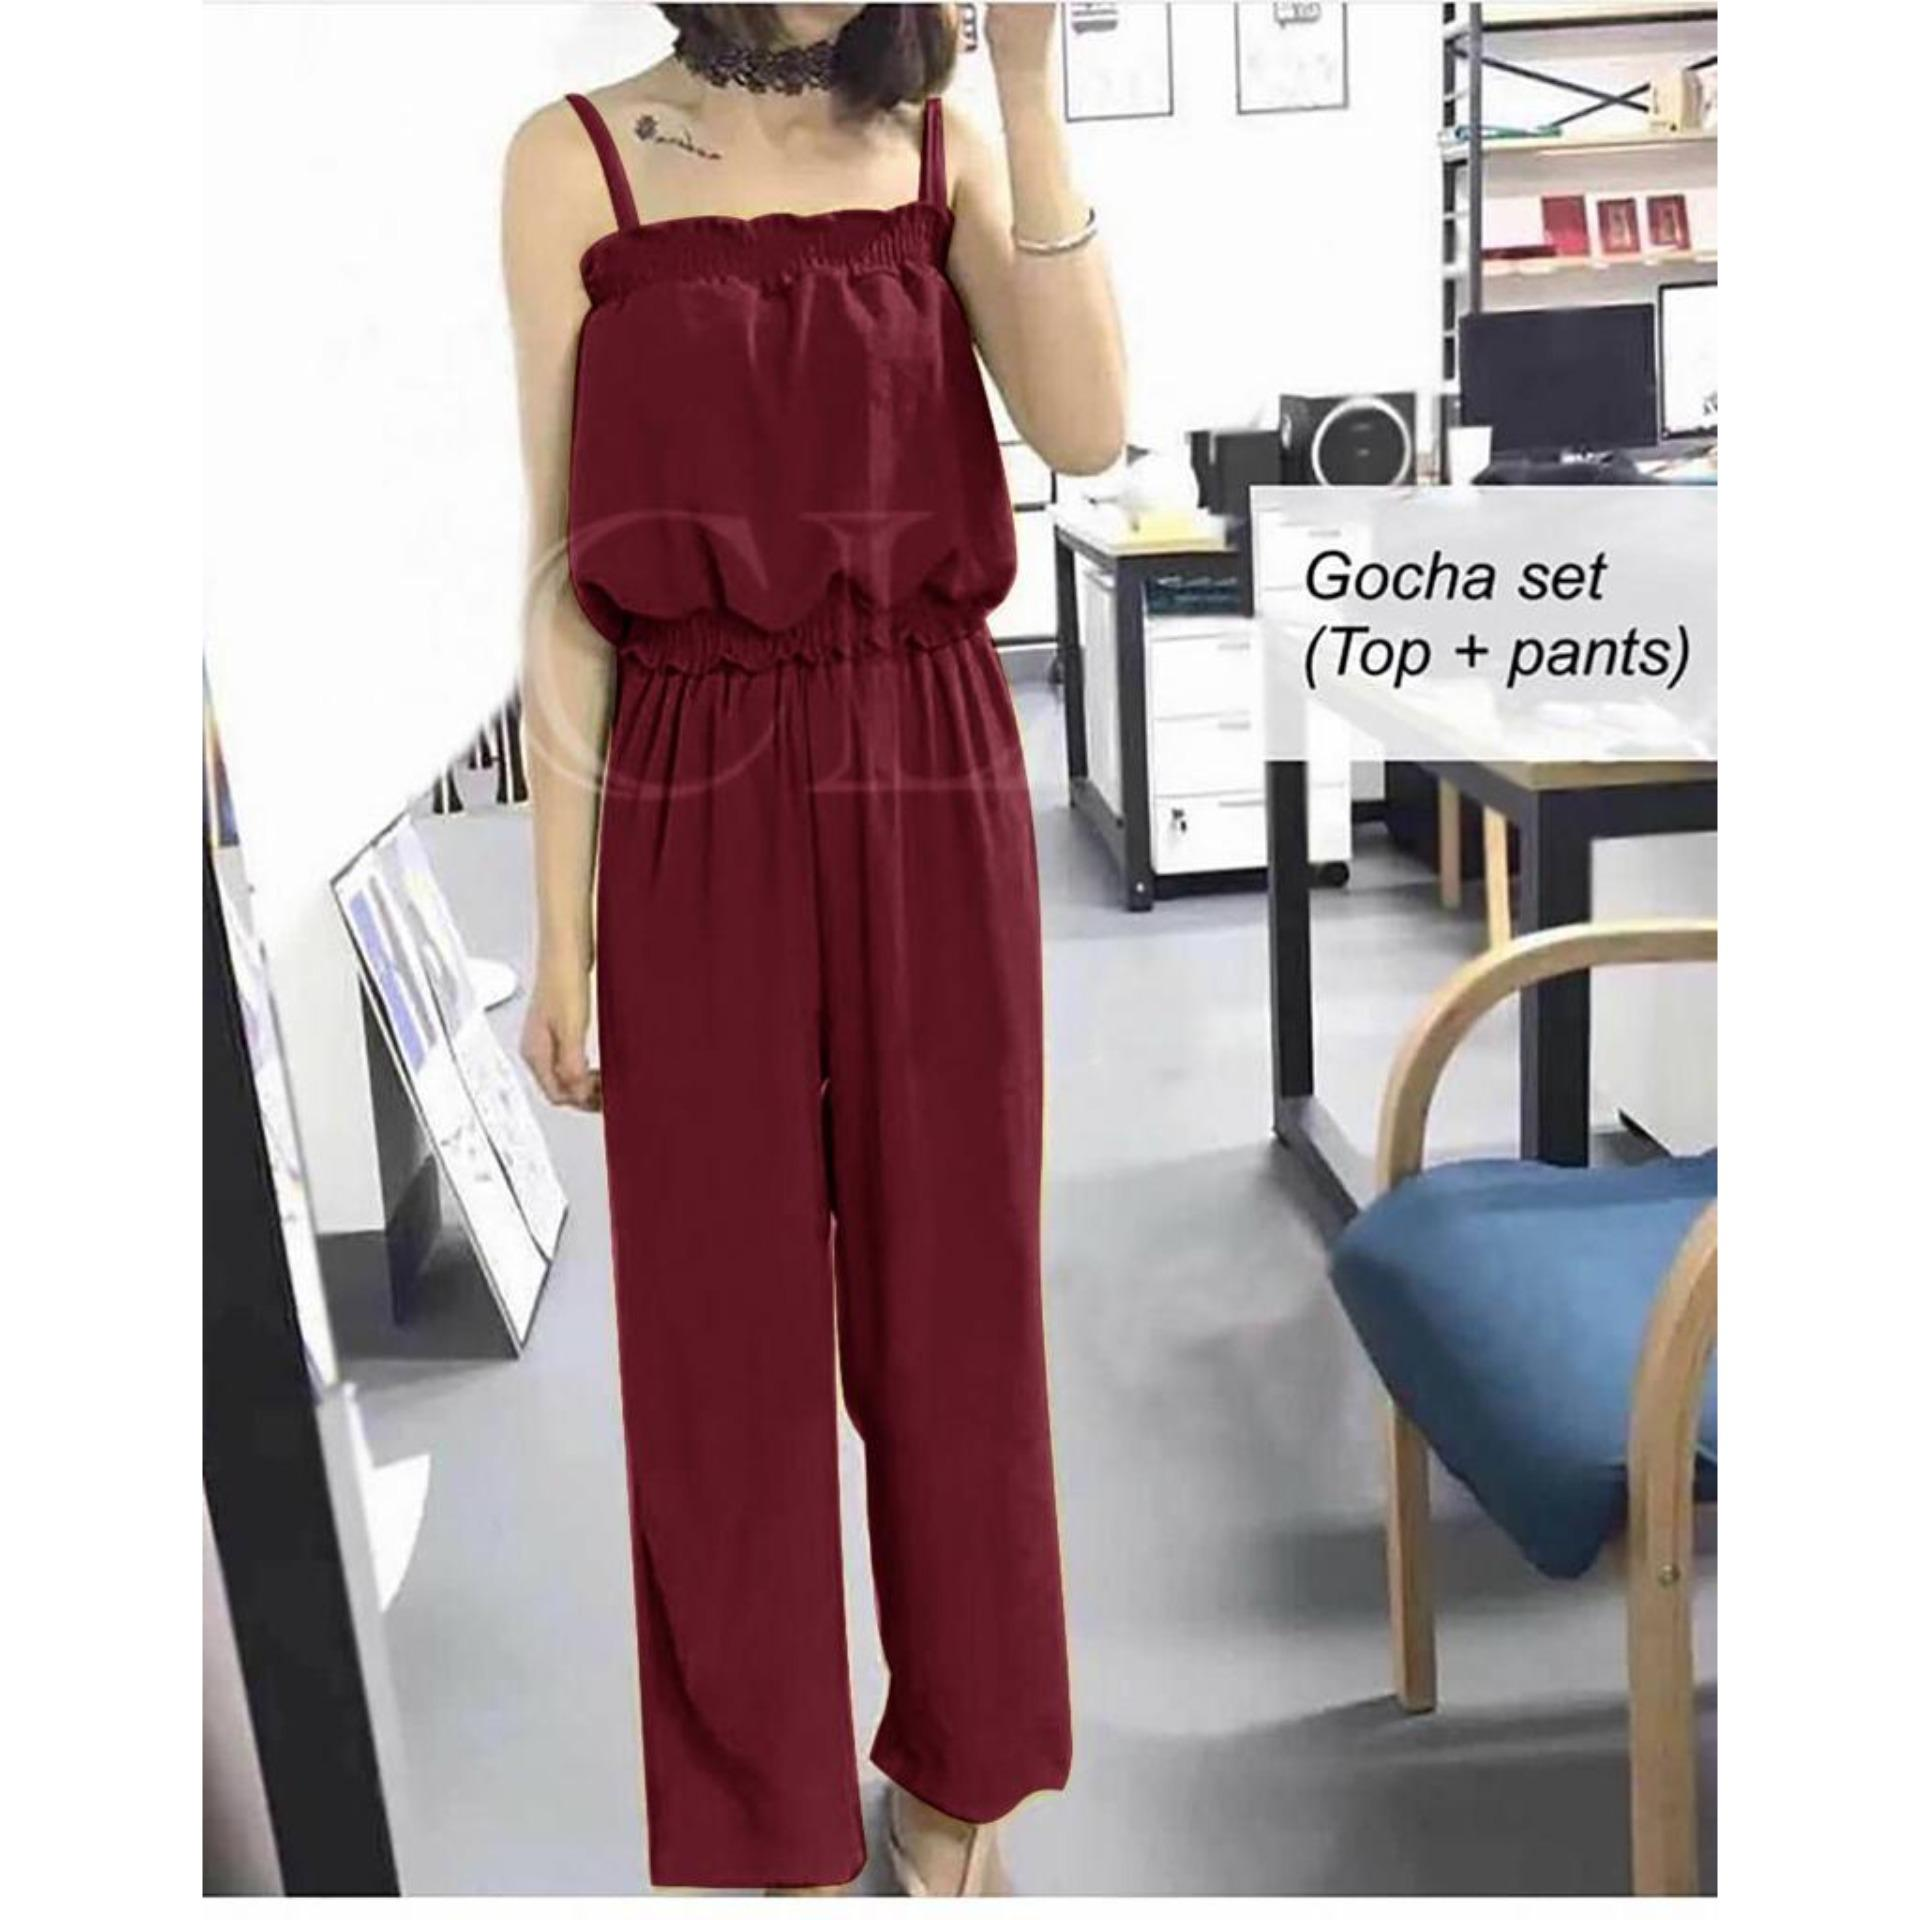 Jual Ch Pakaian Kemeja Jeans Rok Baju Busana Kaos Atasan Untuk Cewe Setelan Kodok Panda 1125 Fashion Hunter Set Wanita Pantai Casual Party Jumsuit